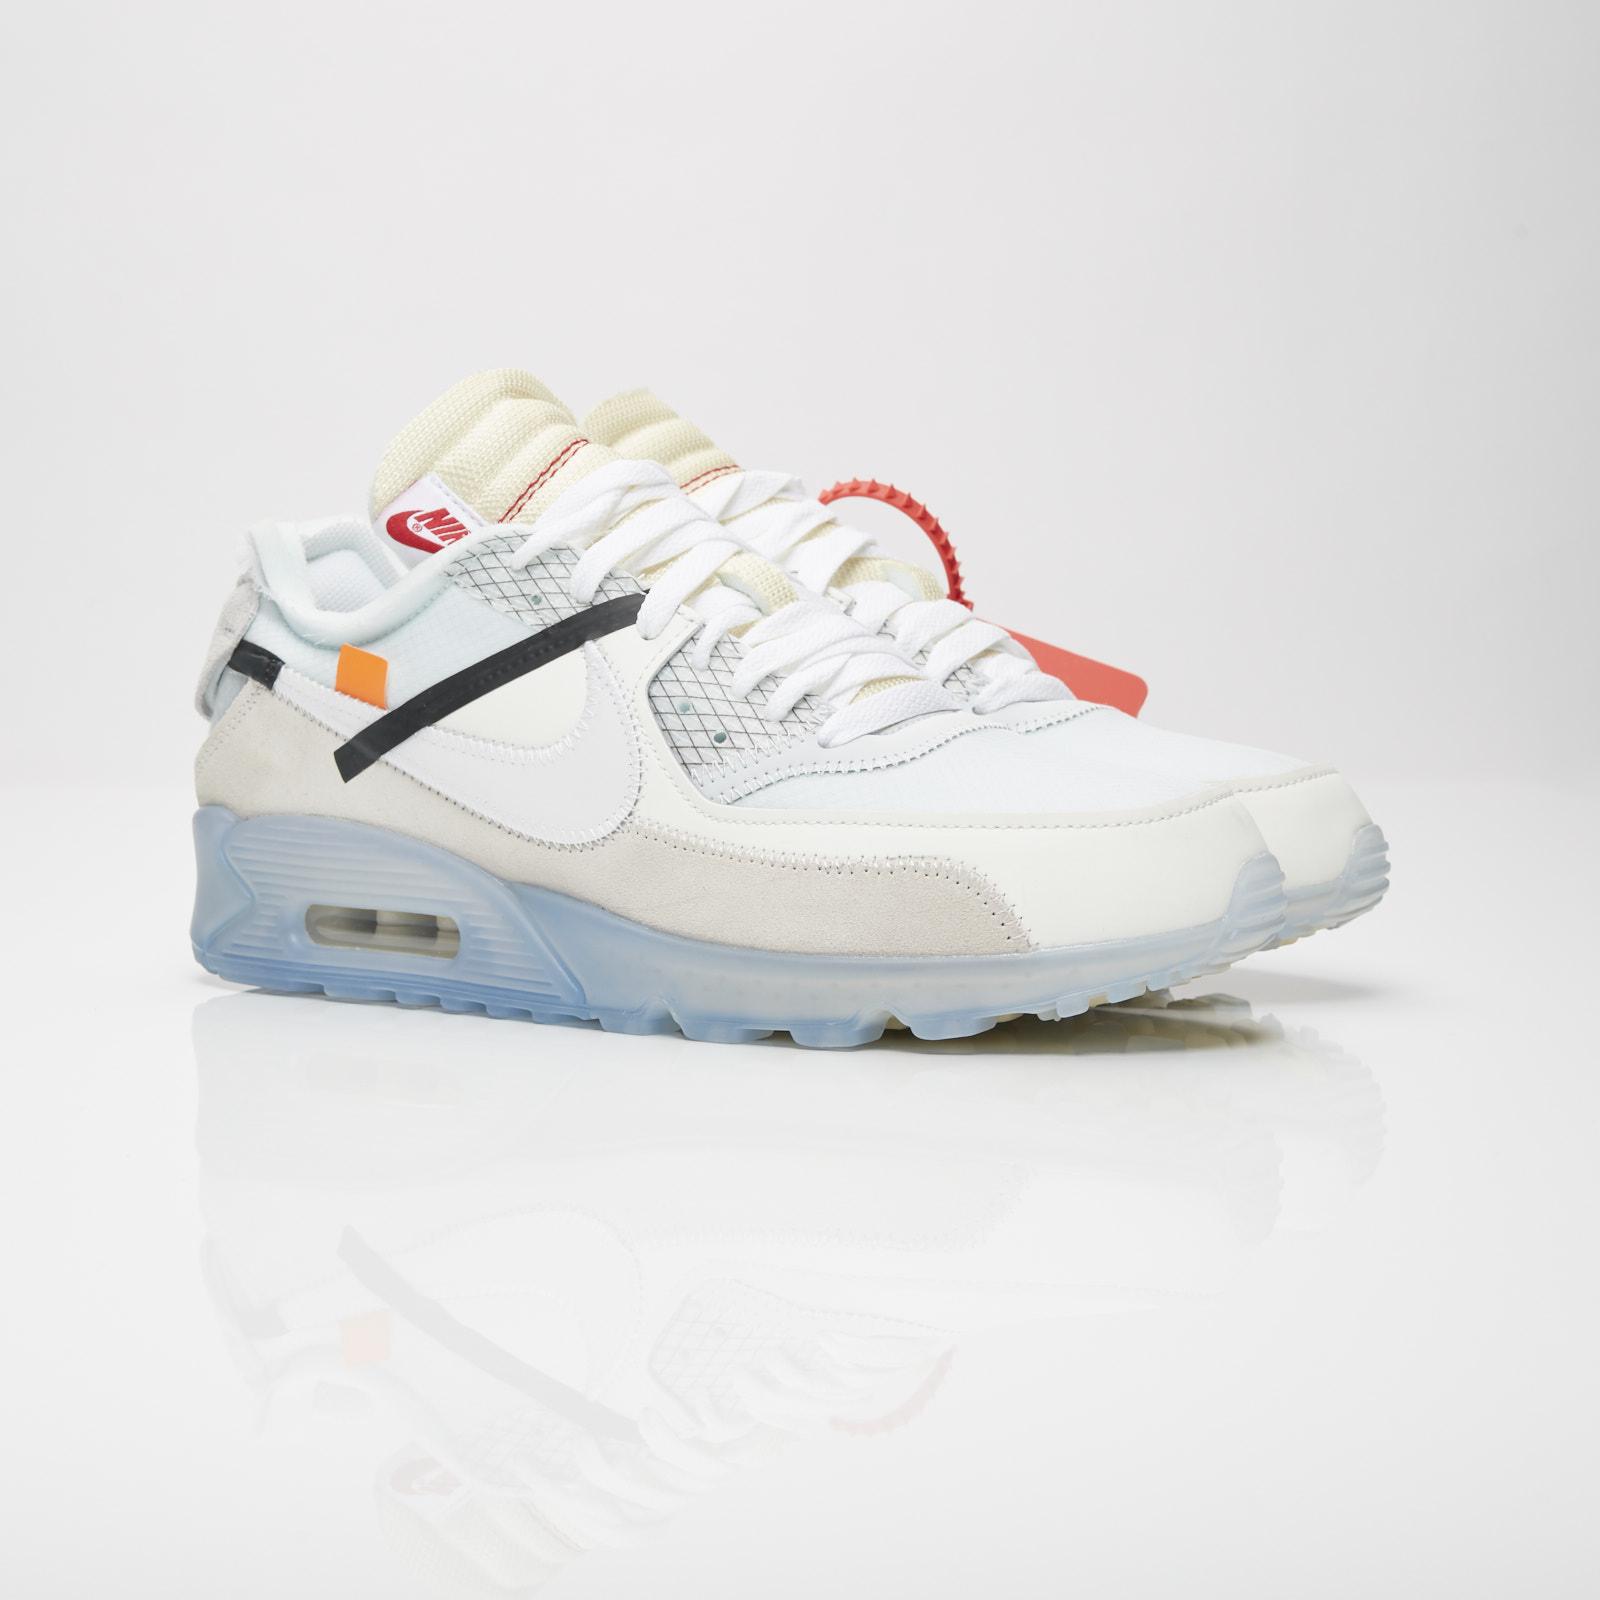 Nike The 10: Air Max 90 - Aa7293-100